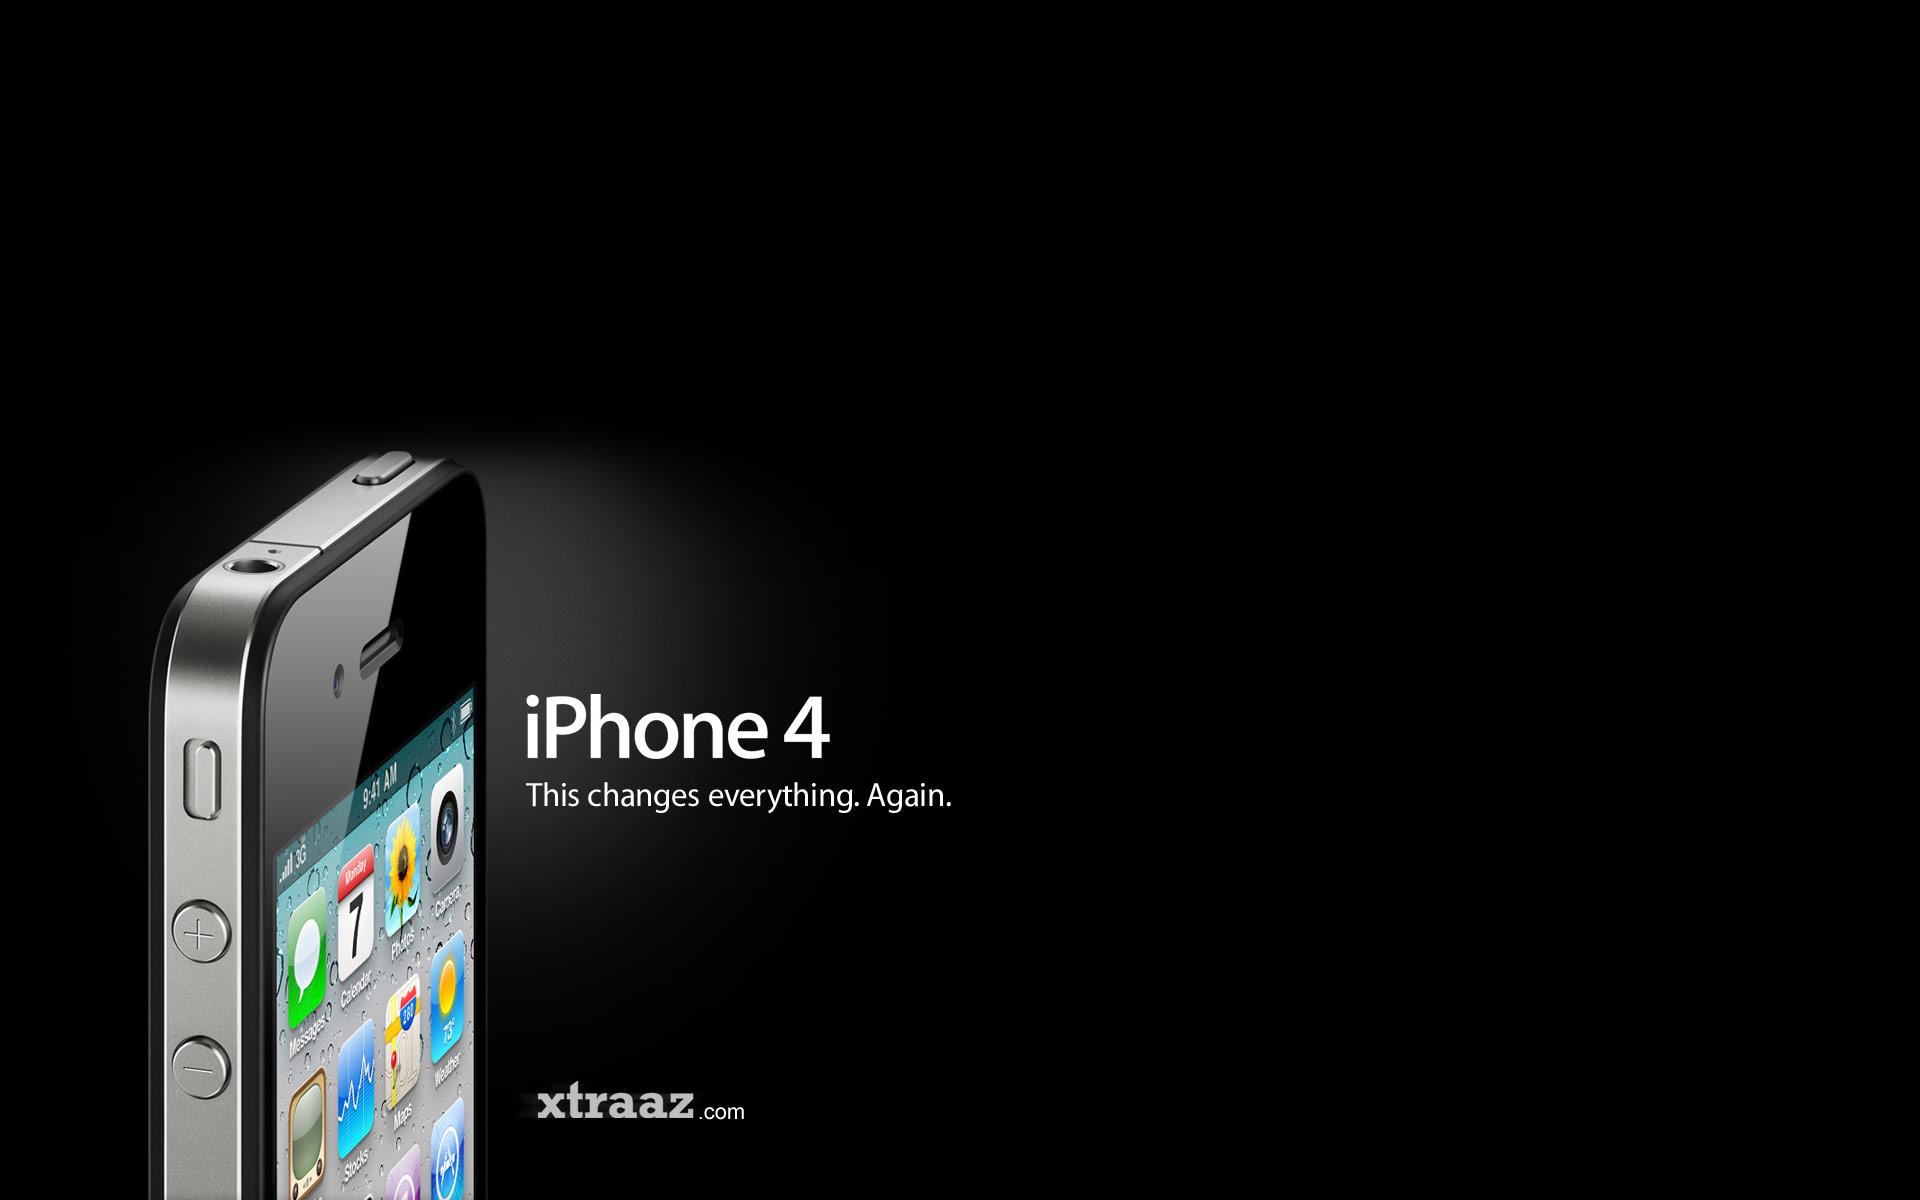 Iphone 4s Wallpaper iPhone 4 Wallpaper Size 1920x1200